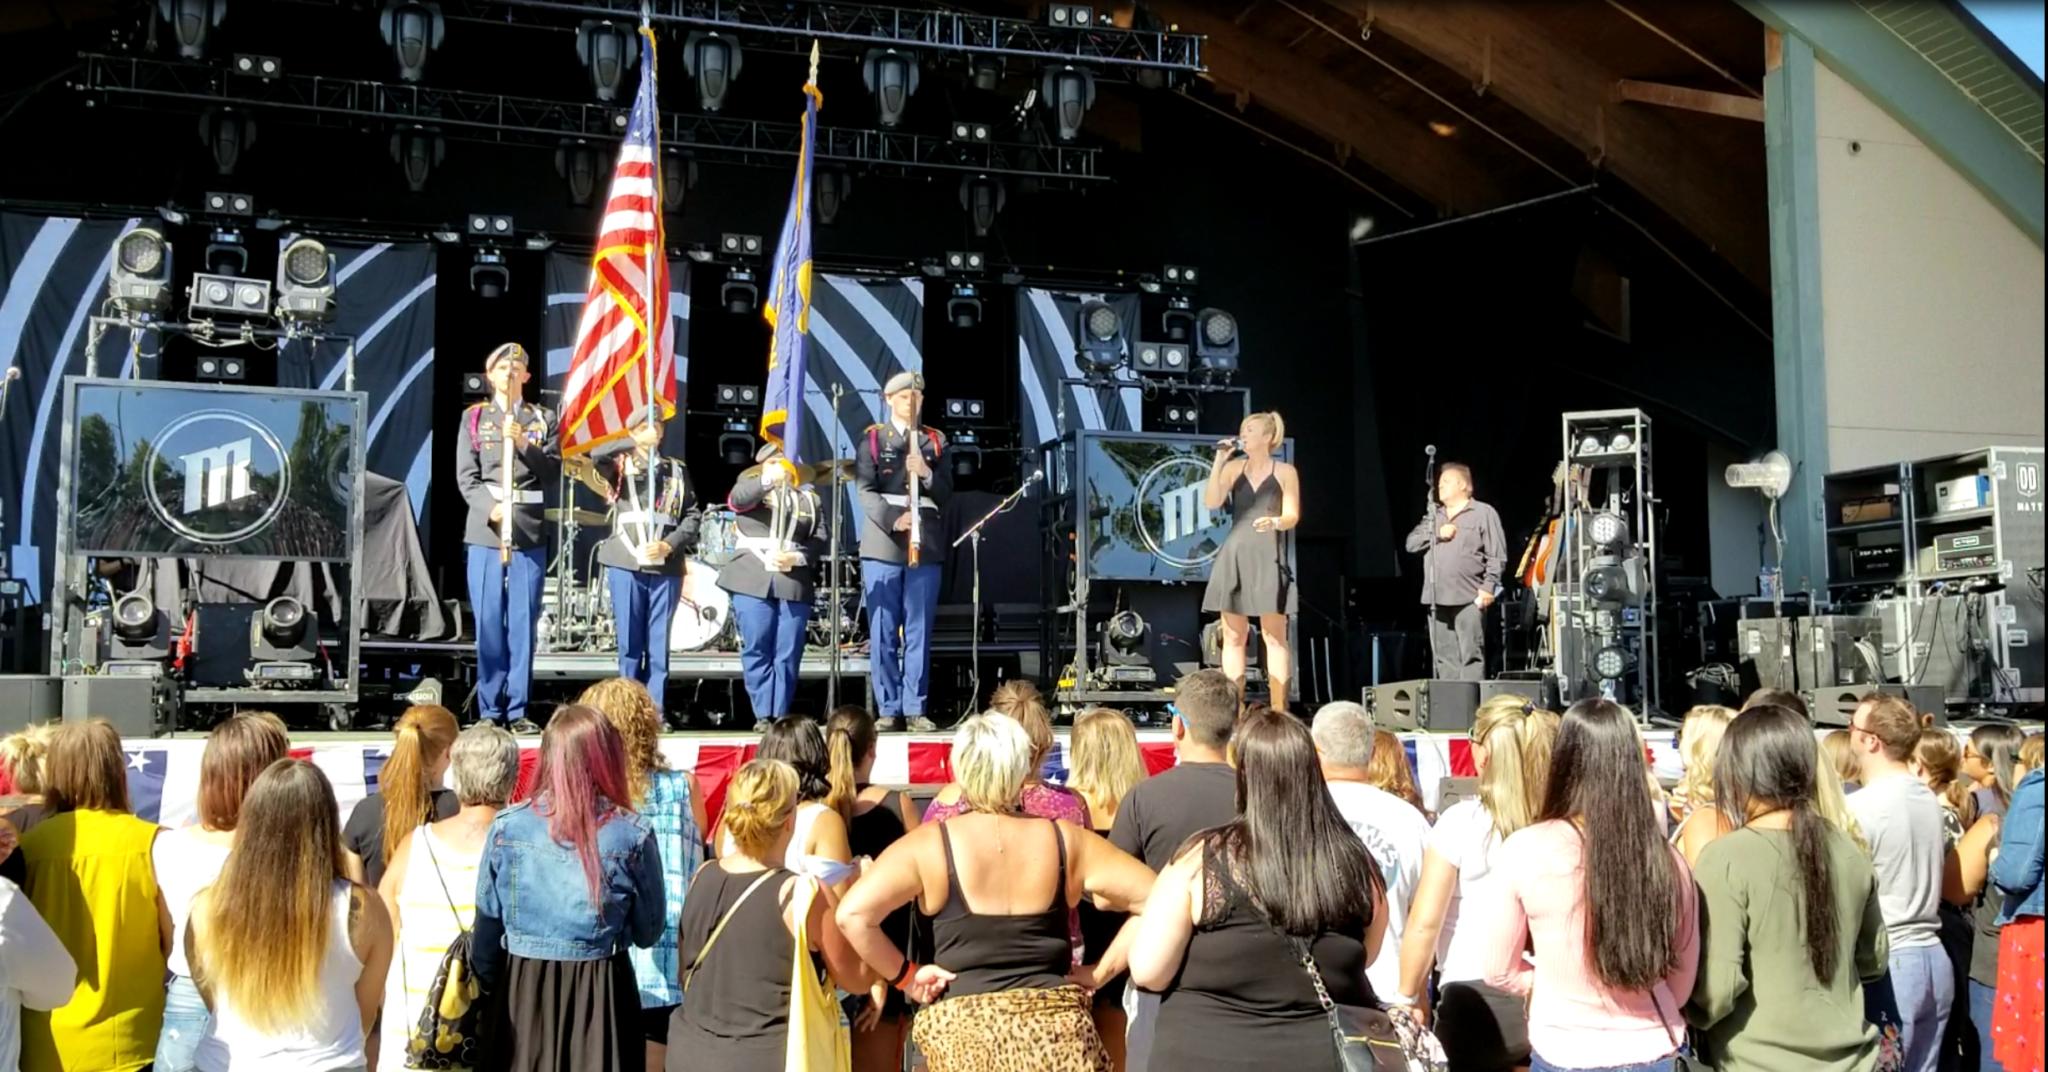 dawna-stafford-anthem-old-dominion-concert-Sept-2018